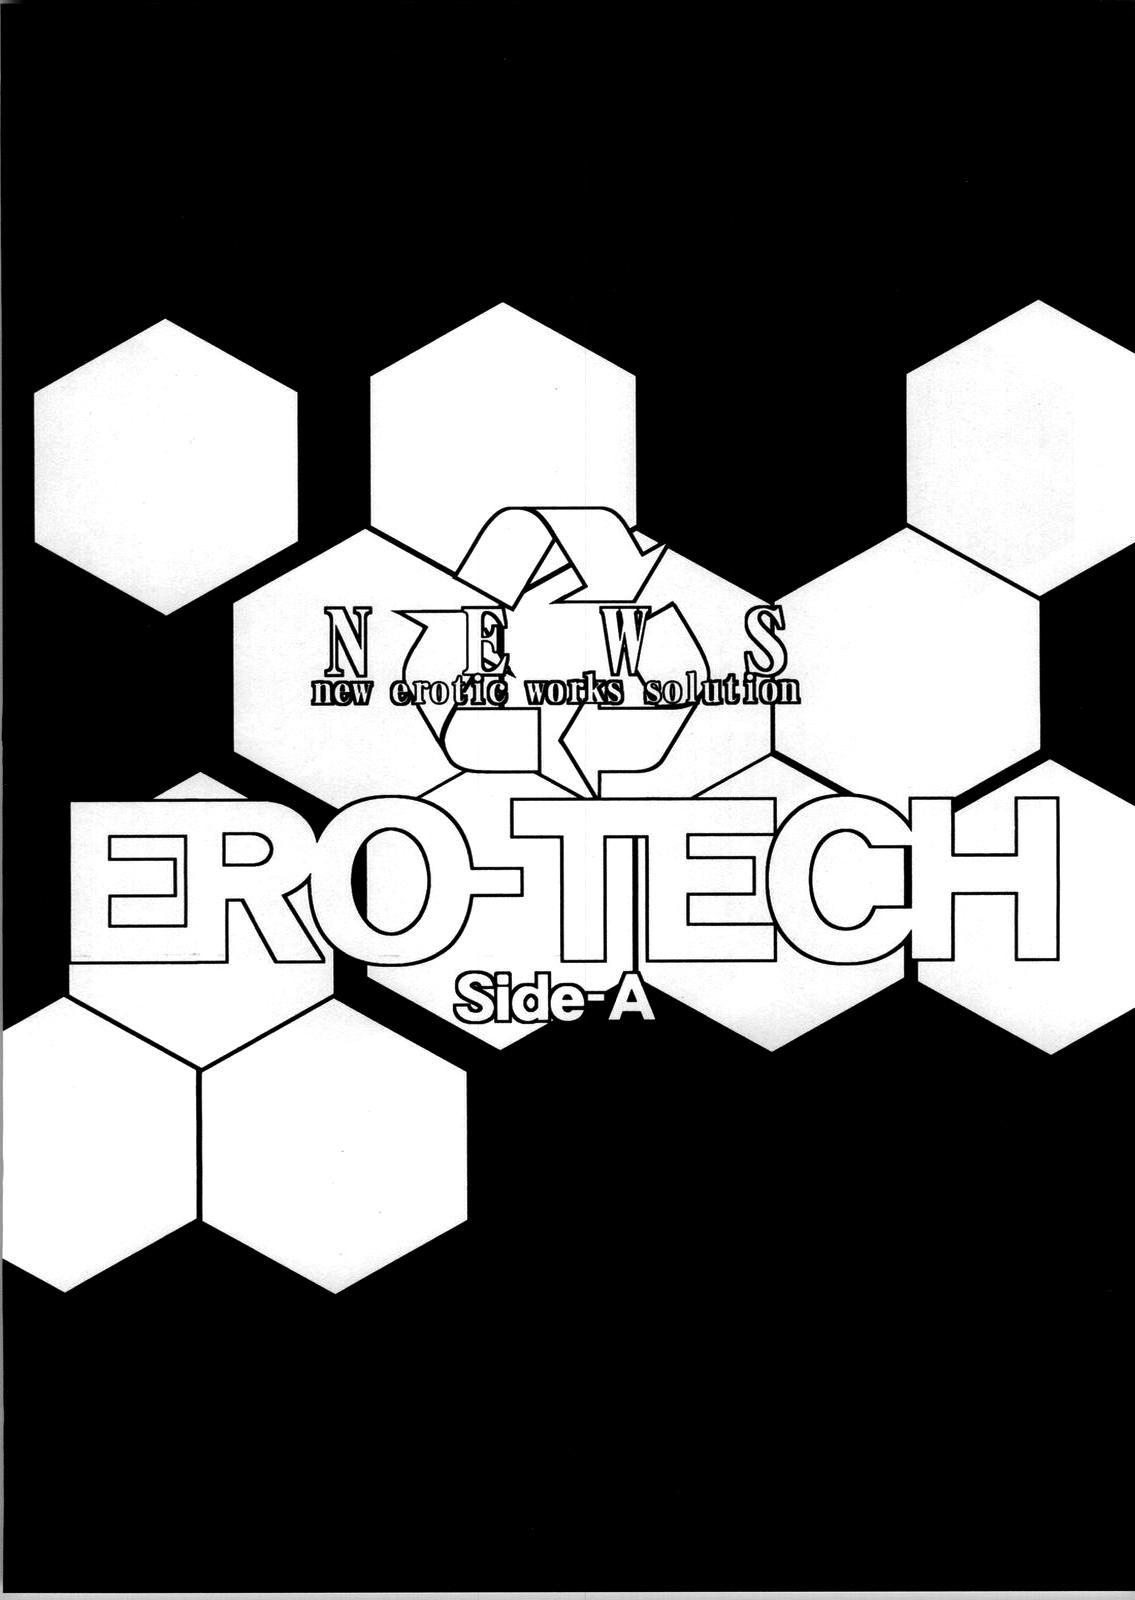 [NEWS (Akow Kazumi, COMA, Yamagata Sei)] ERO-TECH SIDE-A [Textless] 26